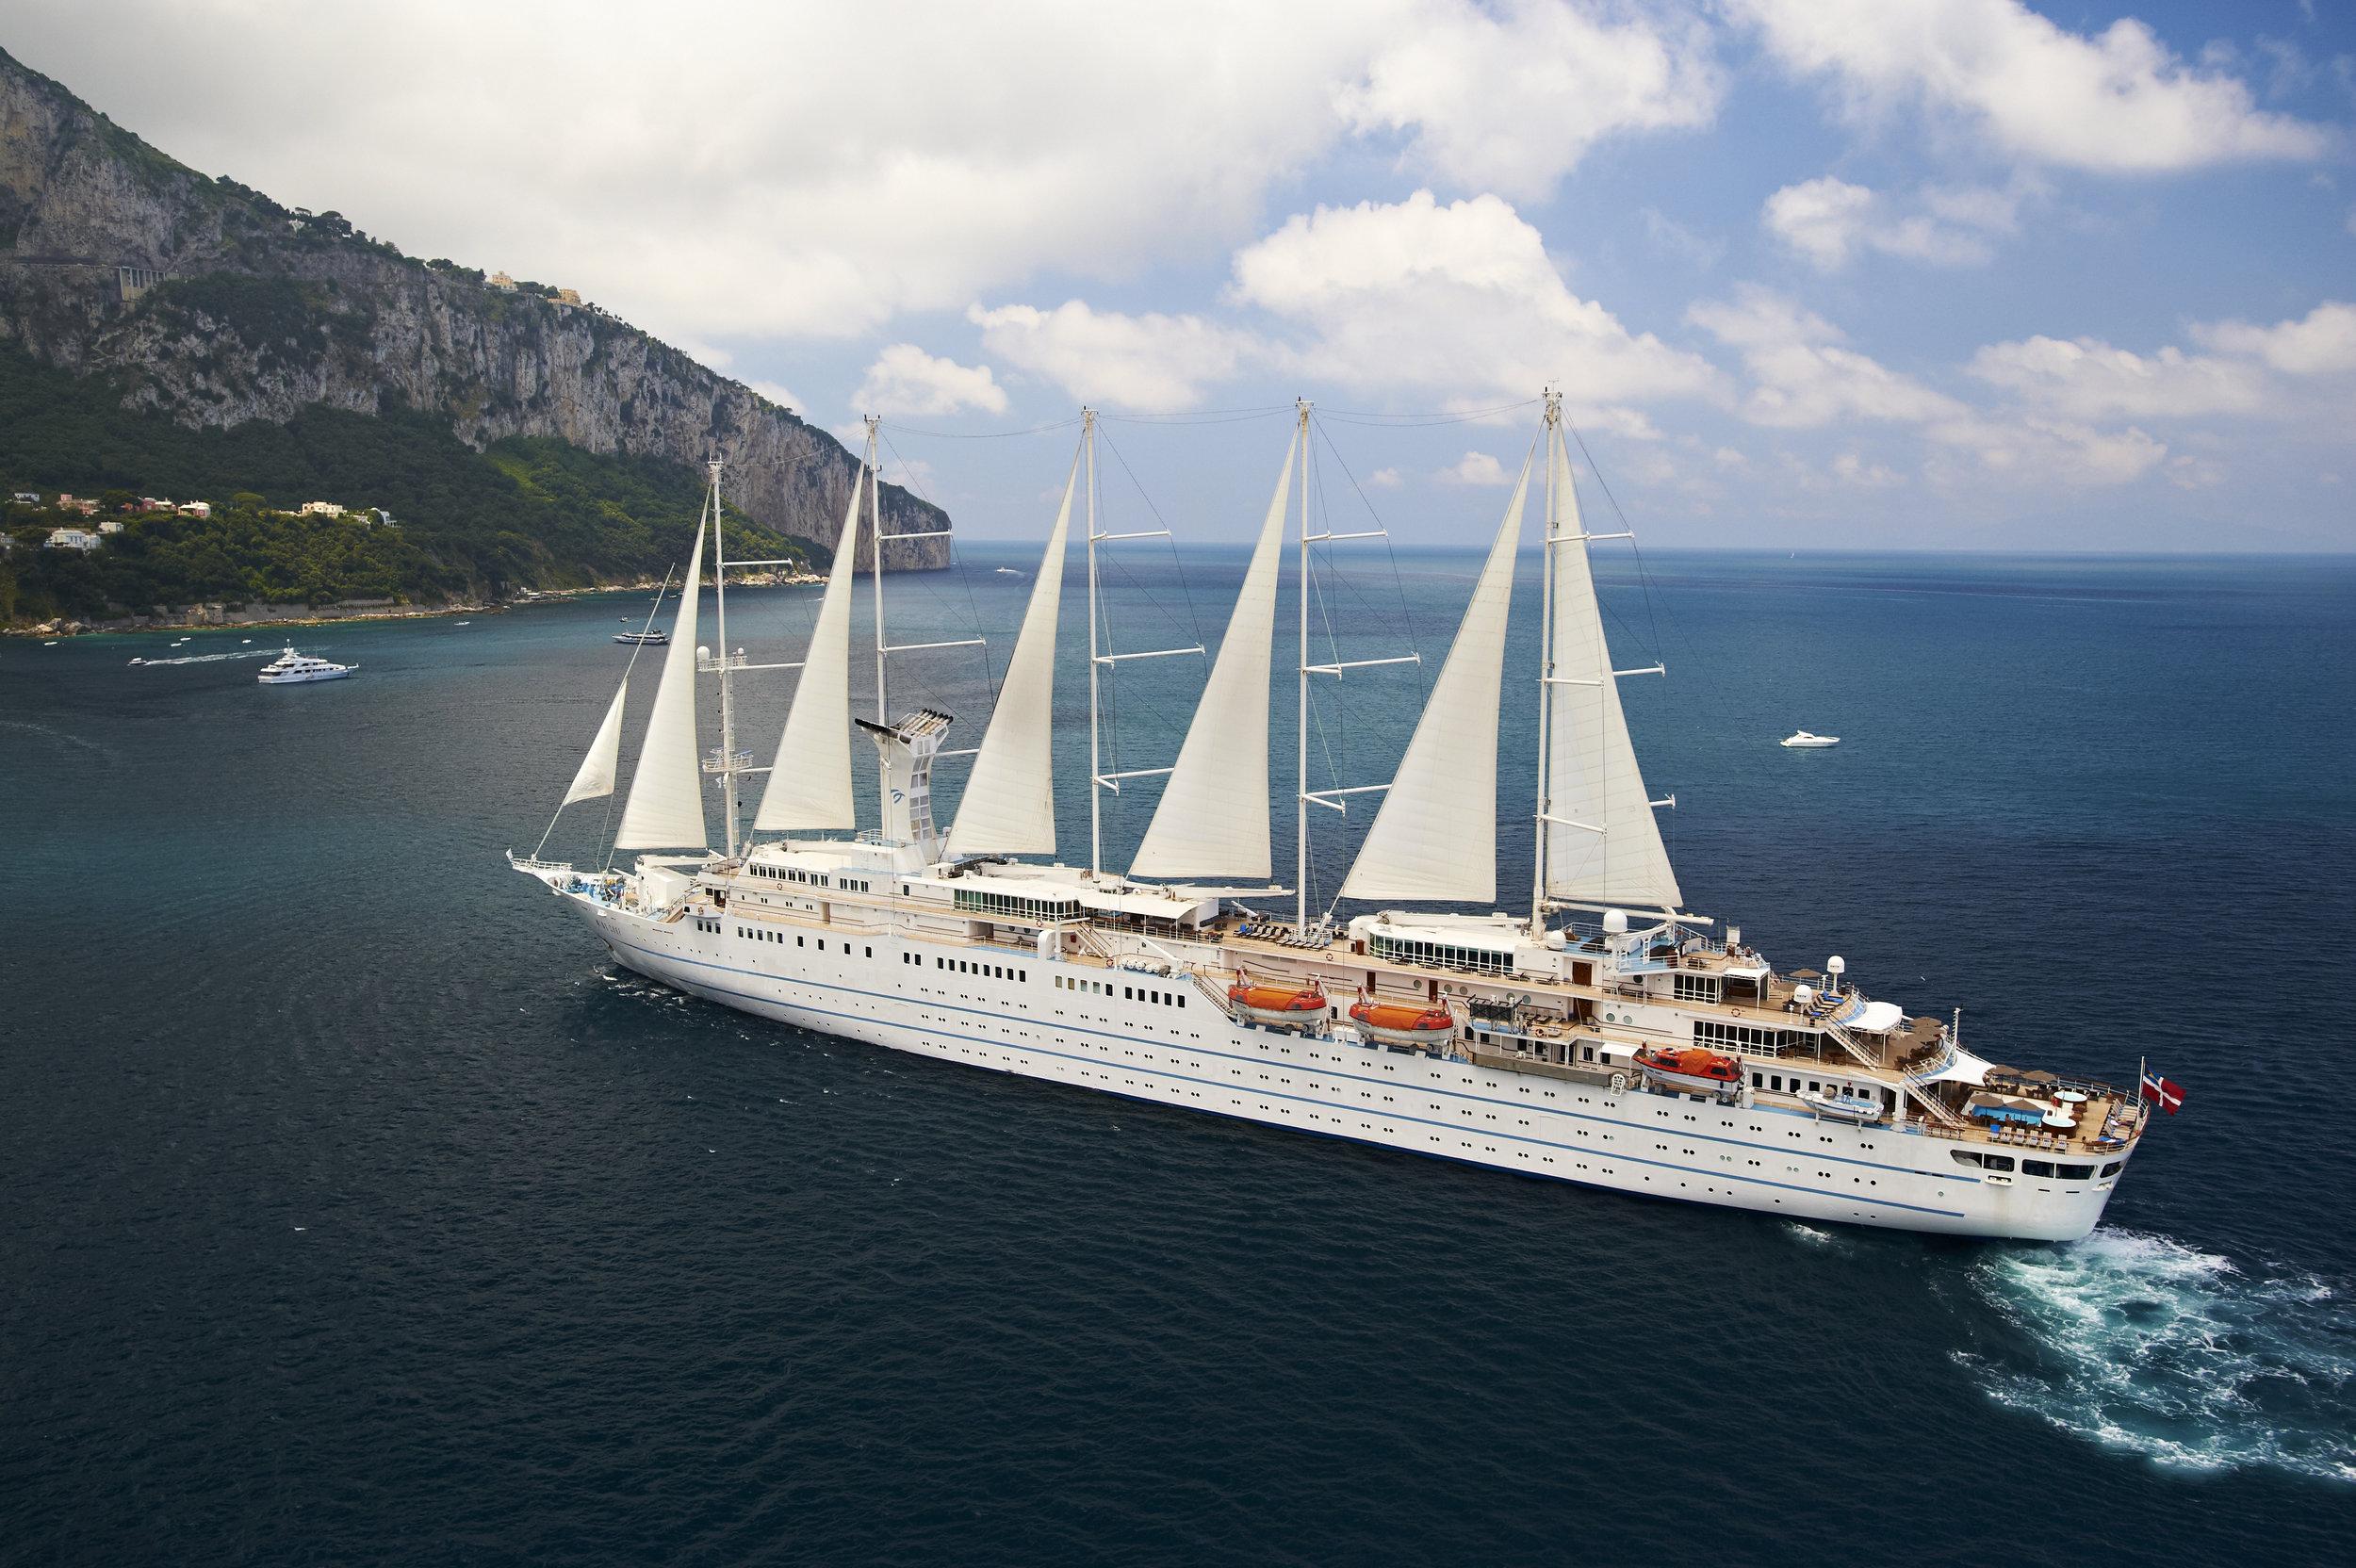 Isle of Capris, Bay of Naples, Italy